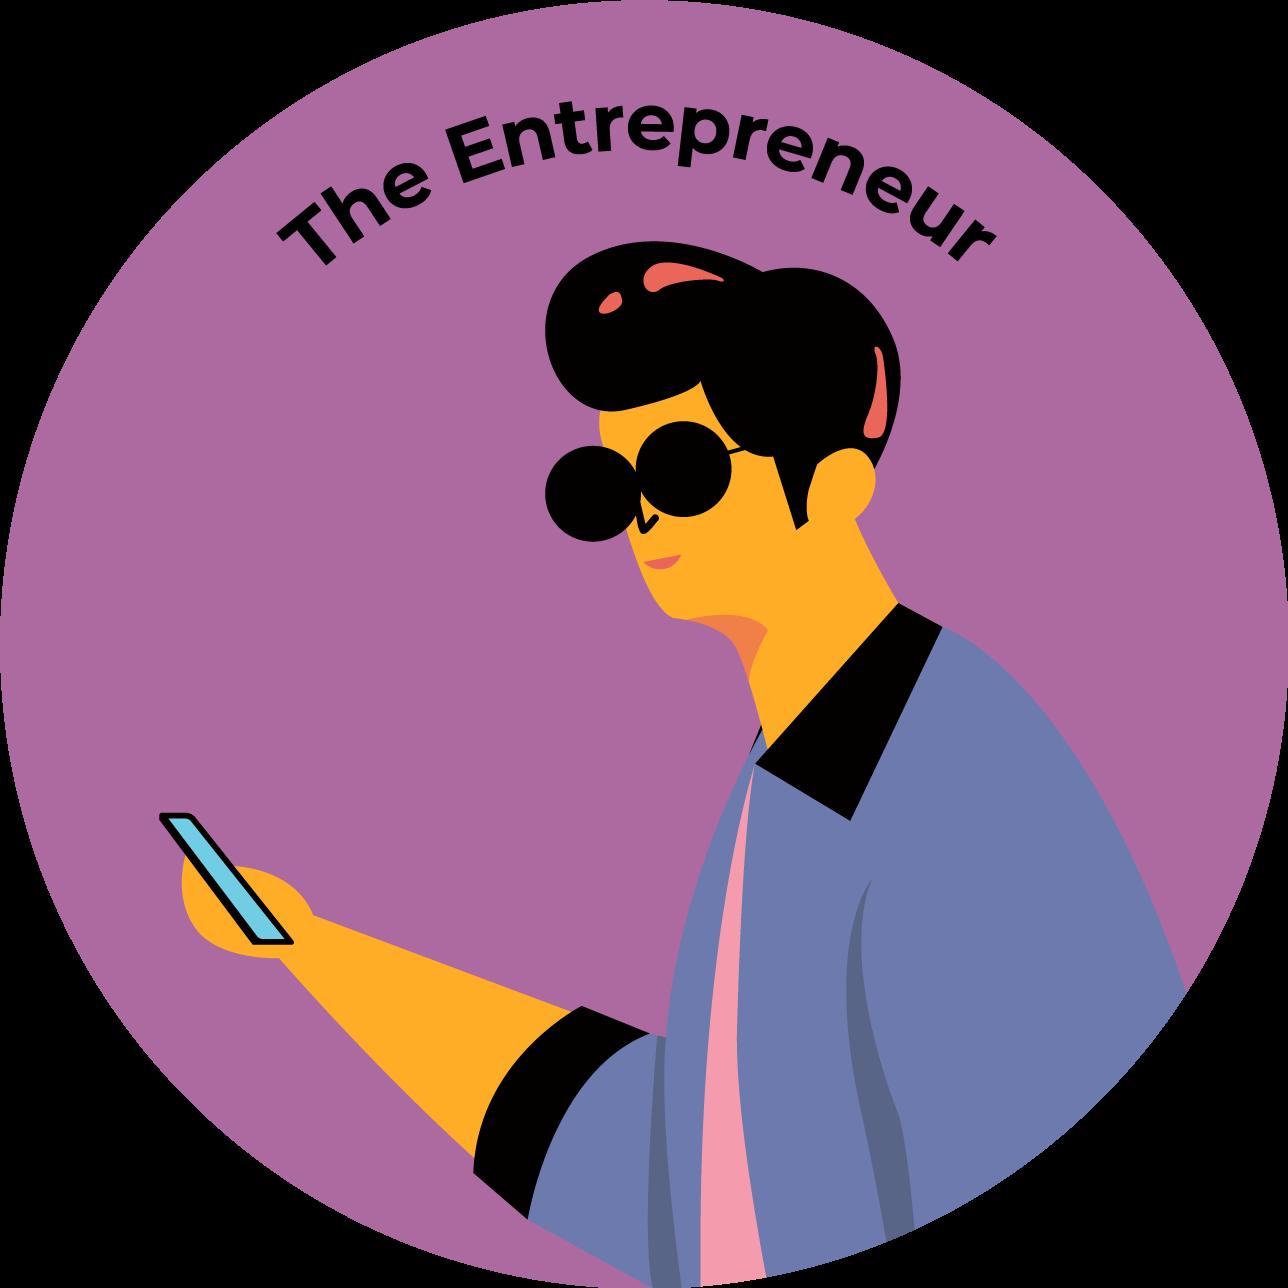 the-entrepreneur.png